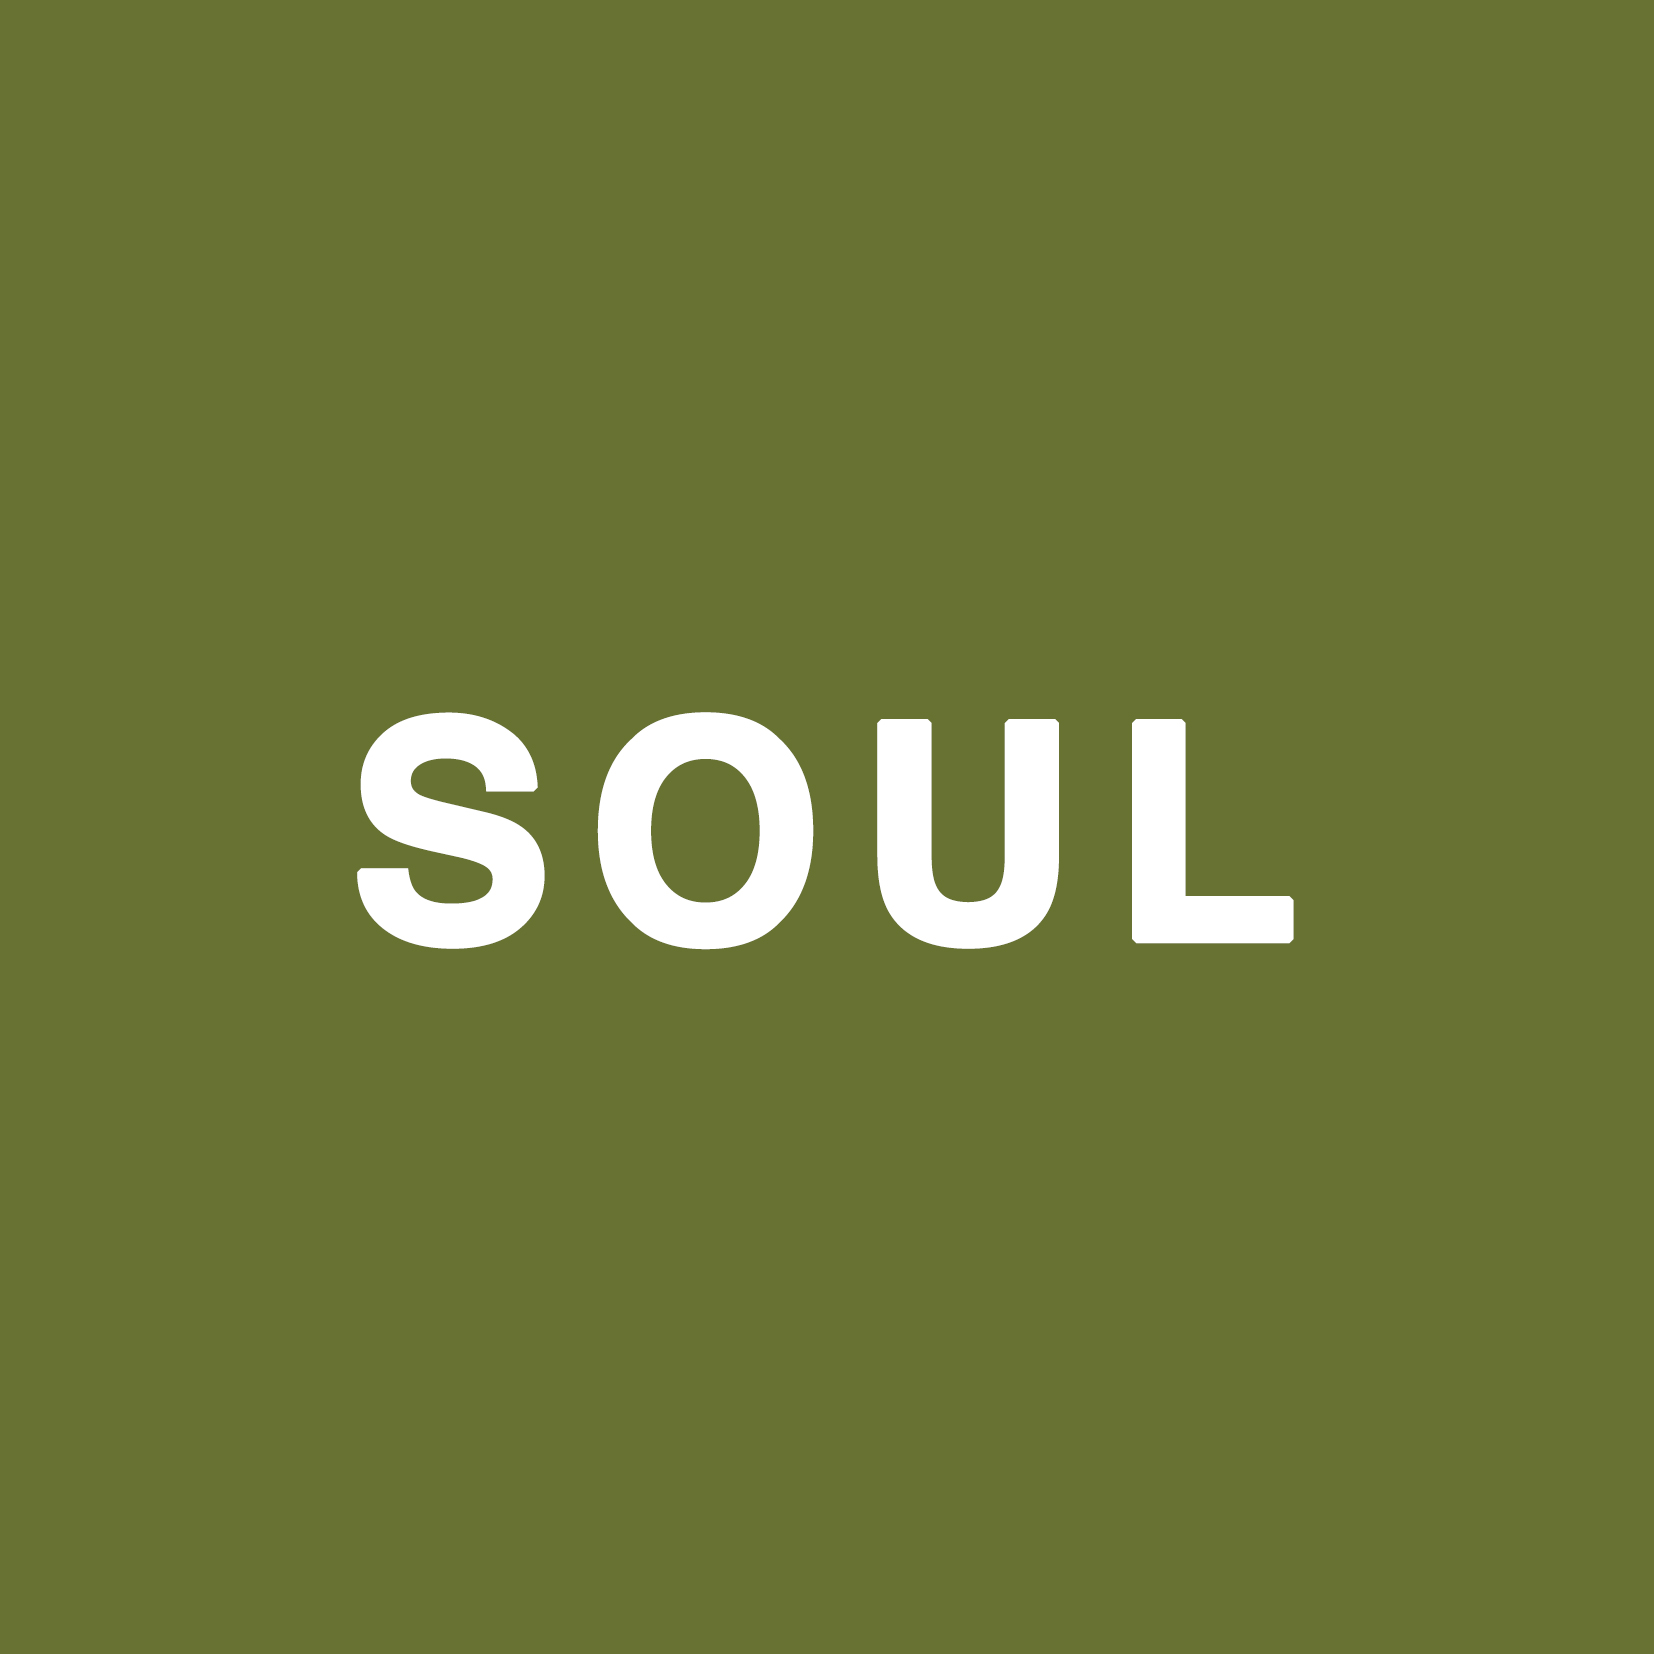 soul2.jpg